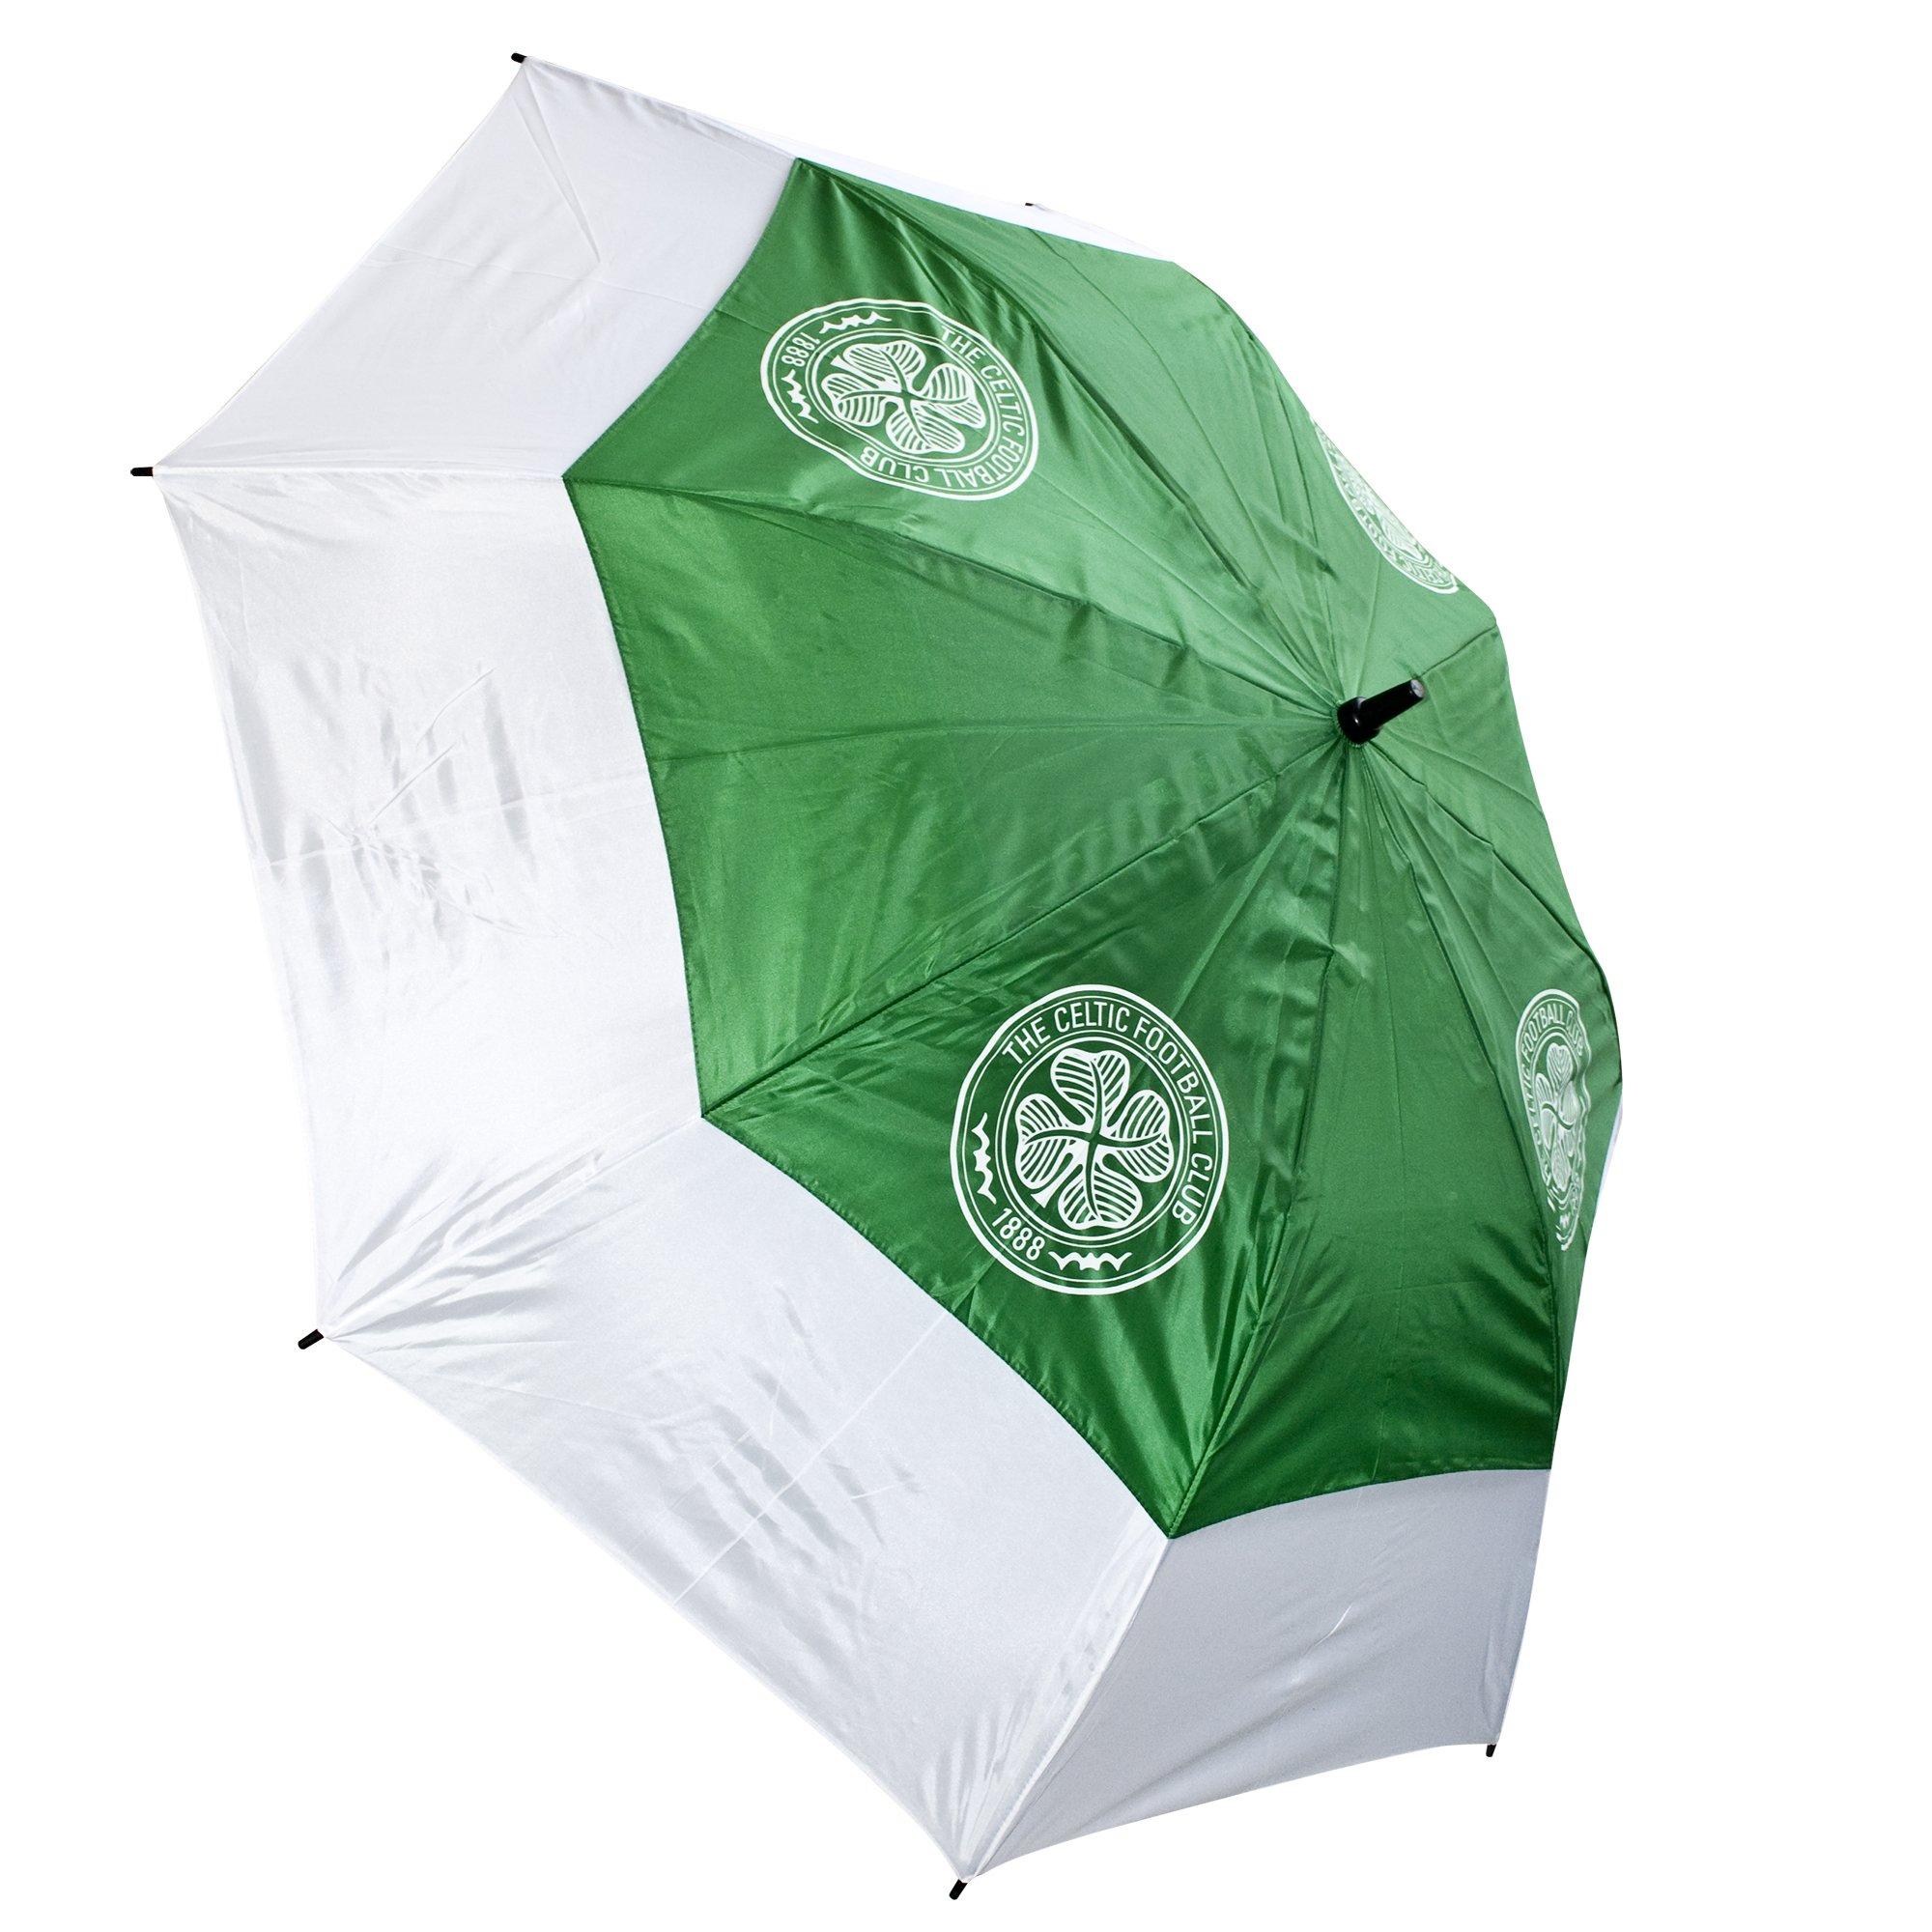 Celtic Fc Tour Vent Golf Umbrella Green/White